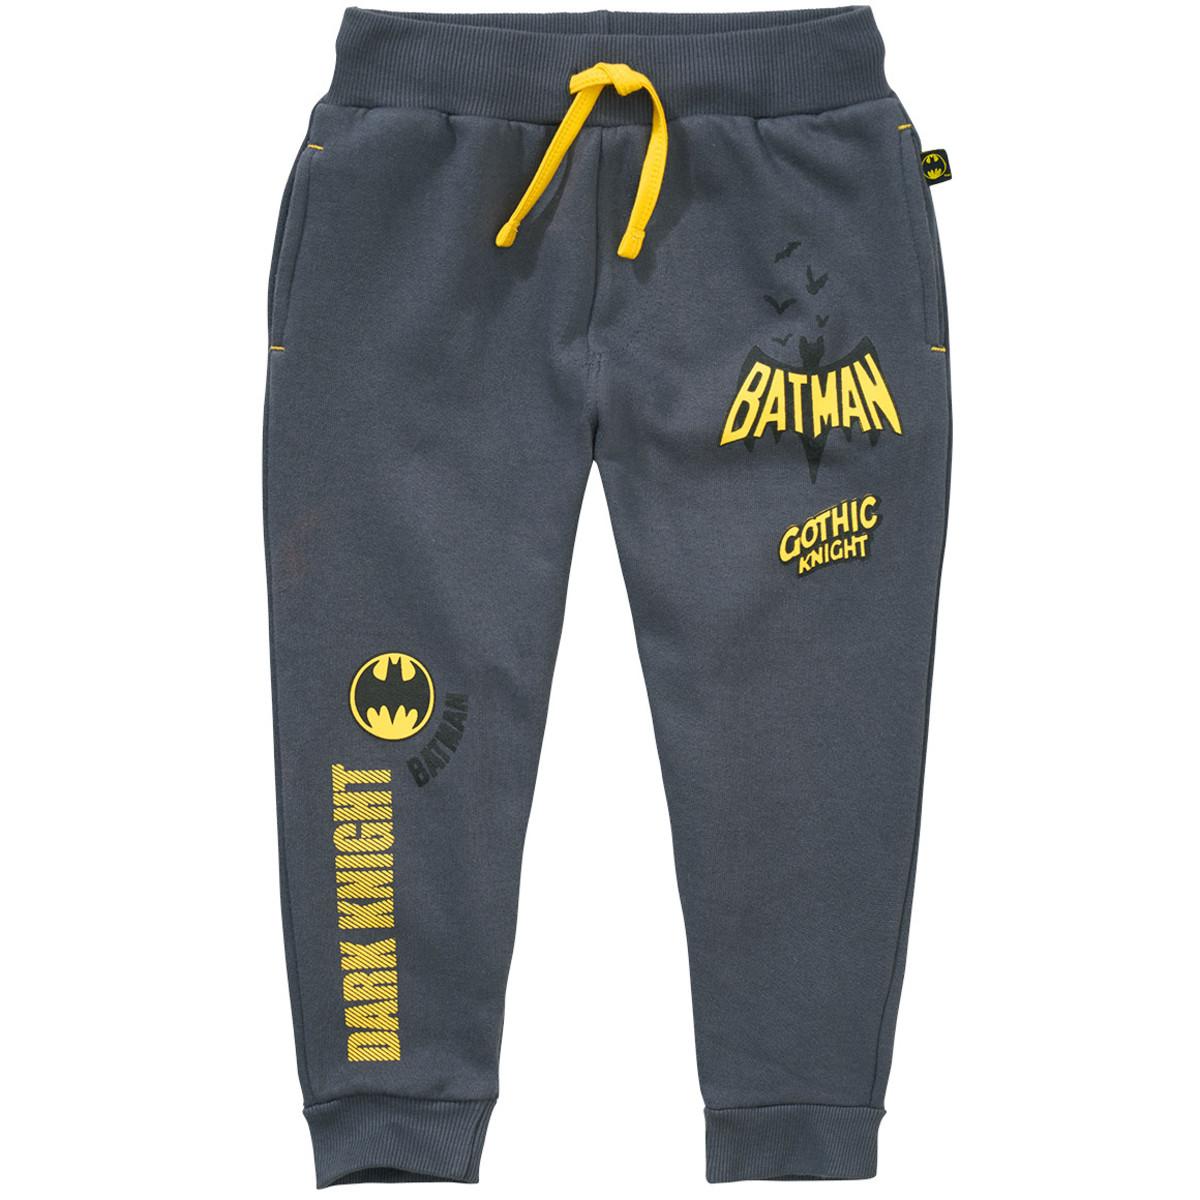 Bild 1 von Batman Jogginghose